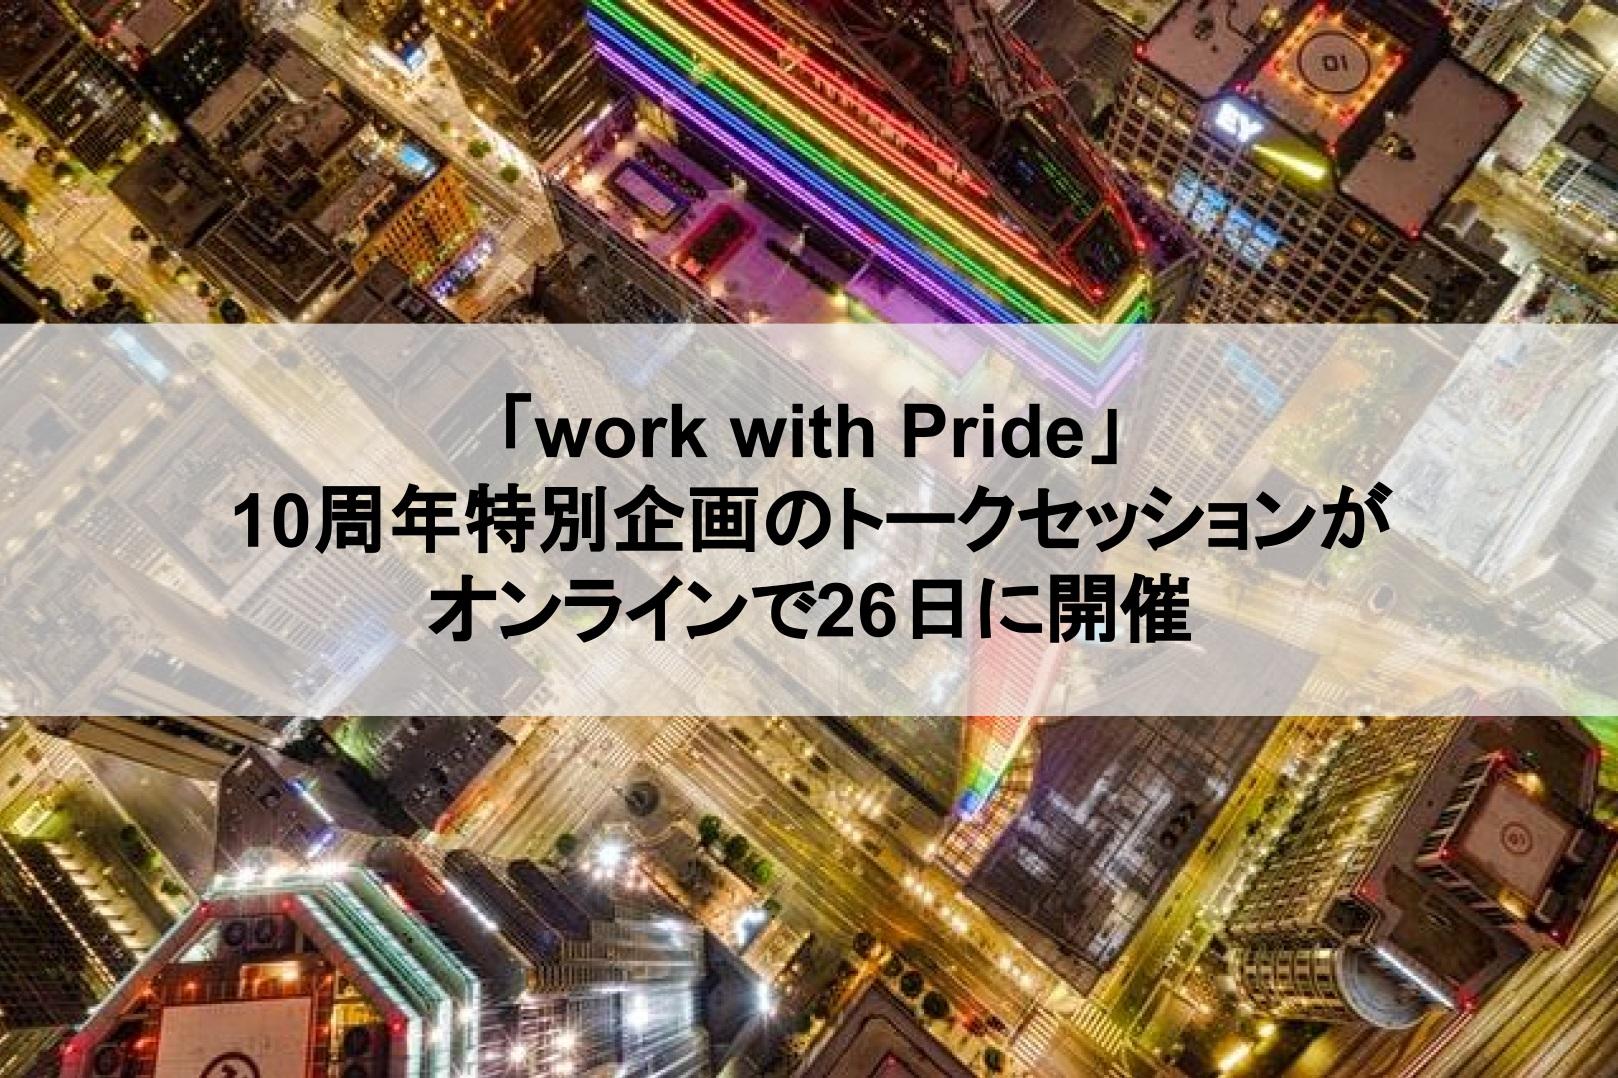 「work with Pride」10周年特別企画のトークセッションがオンラインで26日に開催